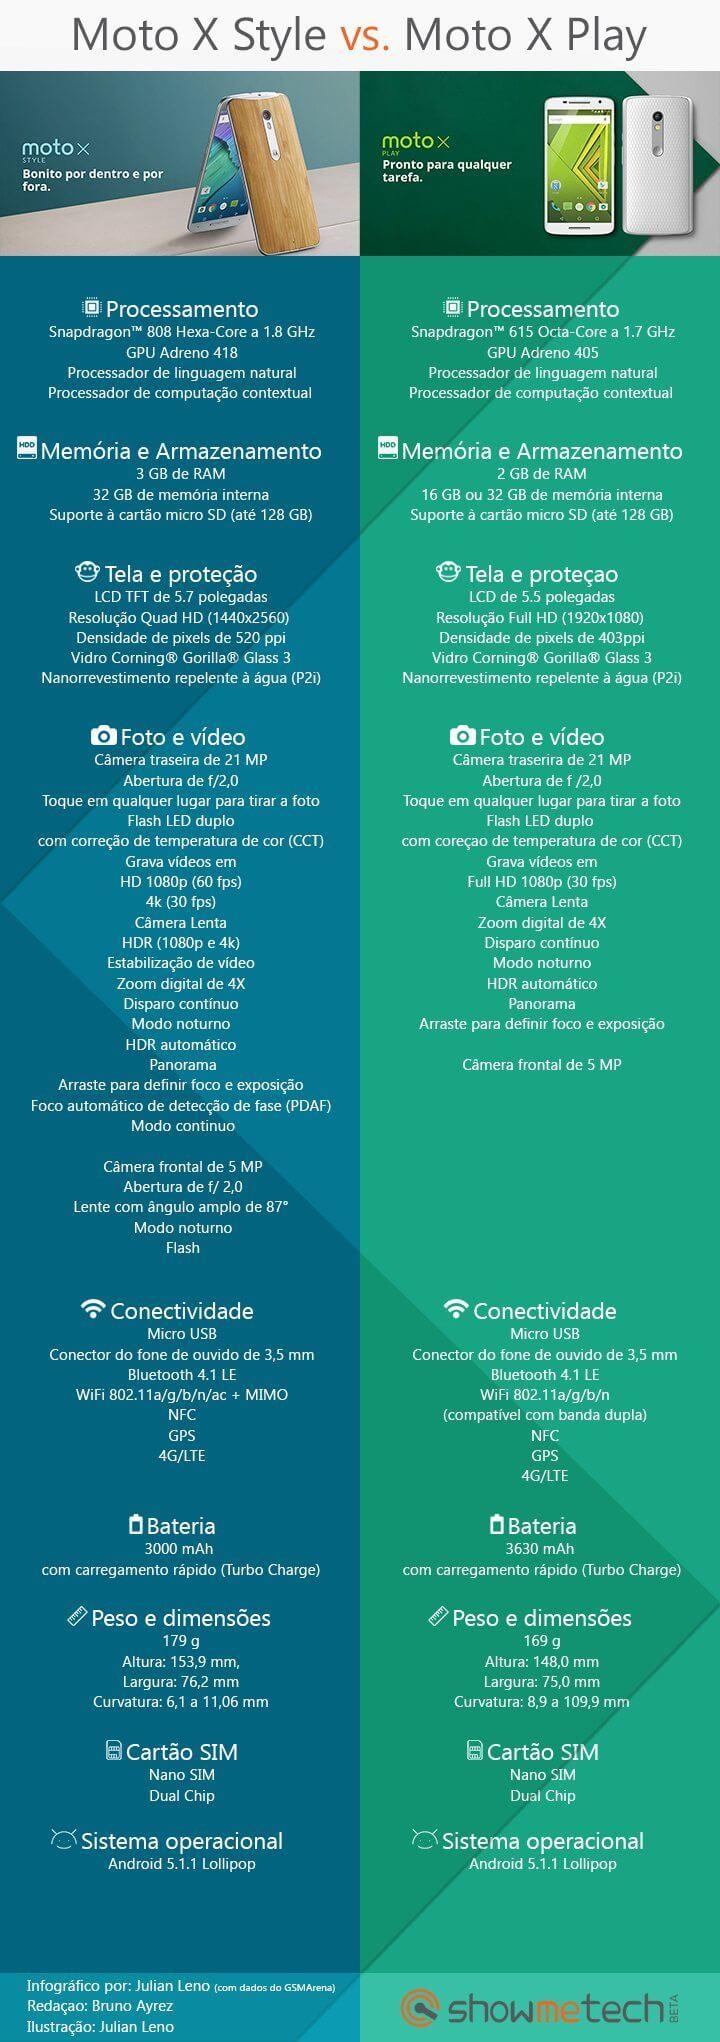 Infográfico: Moto X Stylus vs. Moto X Play